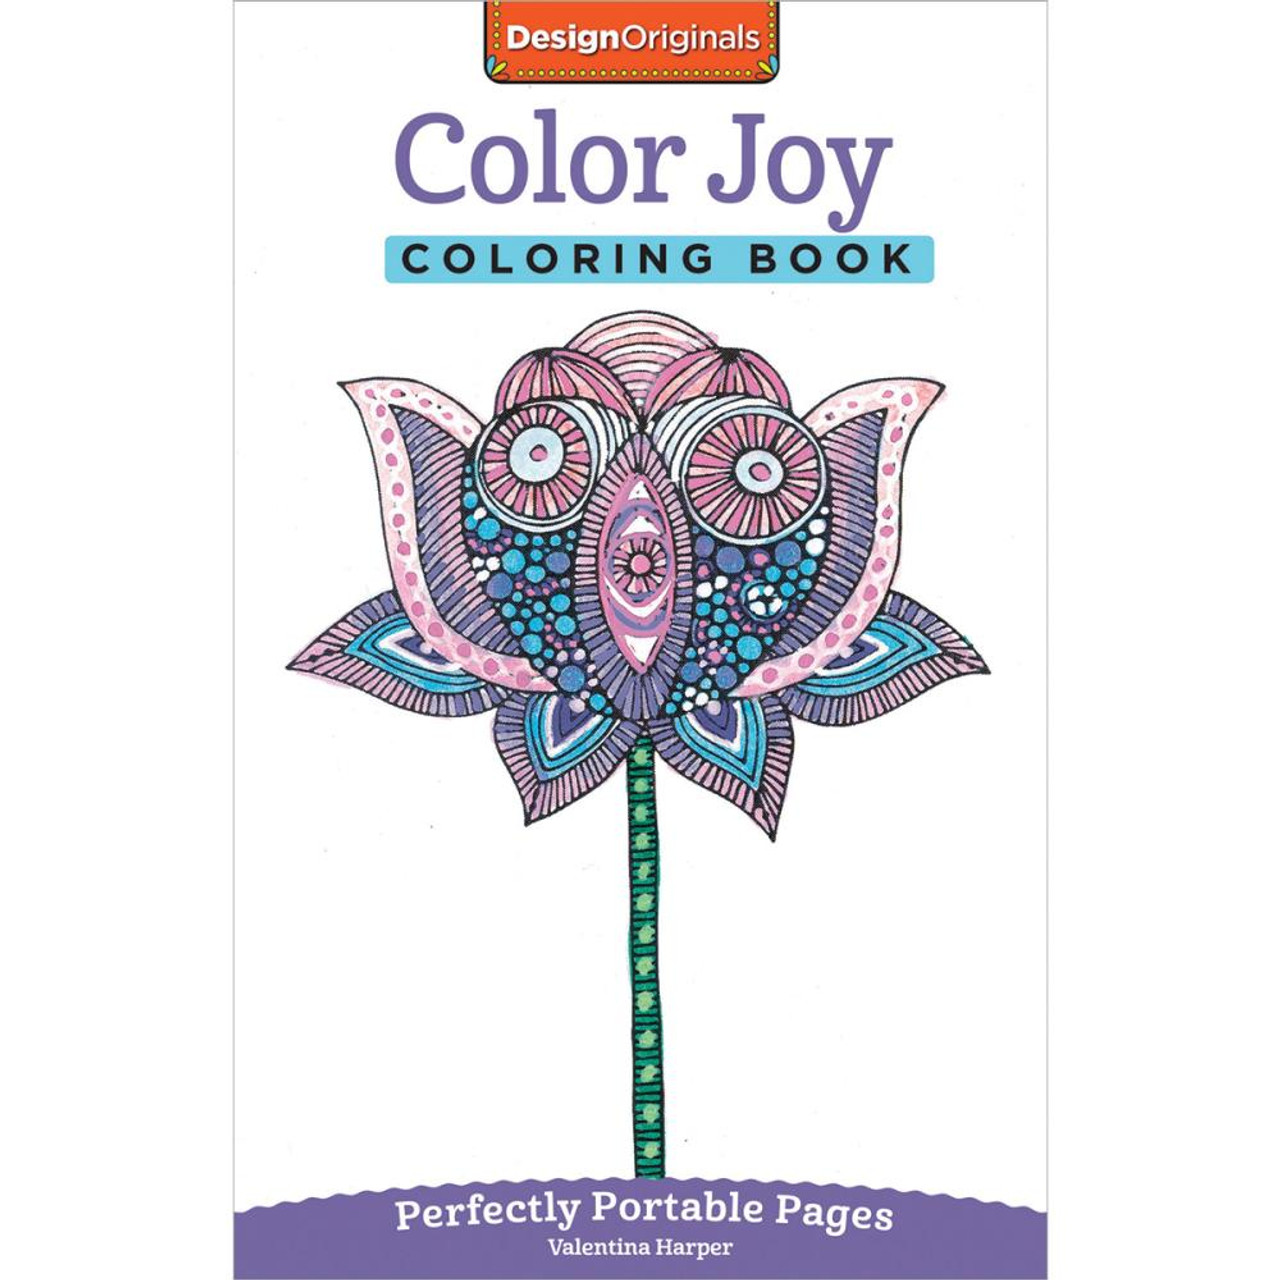 Design Originals Perfectly Portable Pages Coloring Book Color Joy